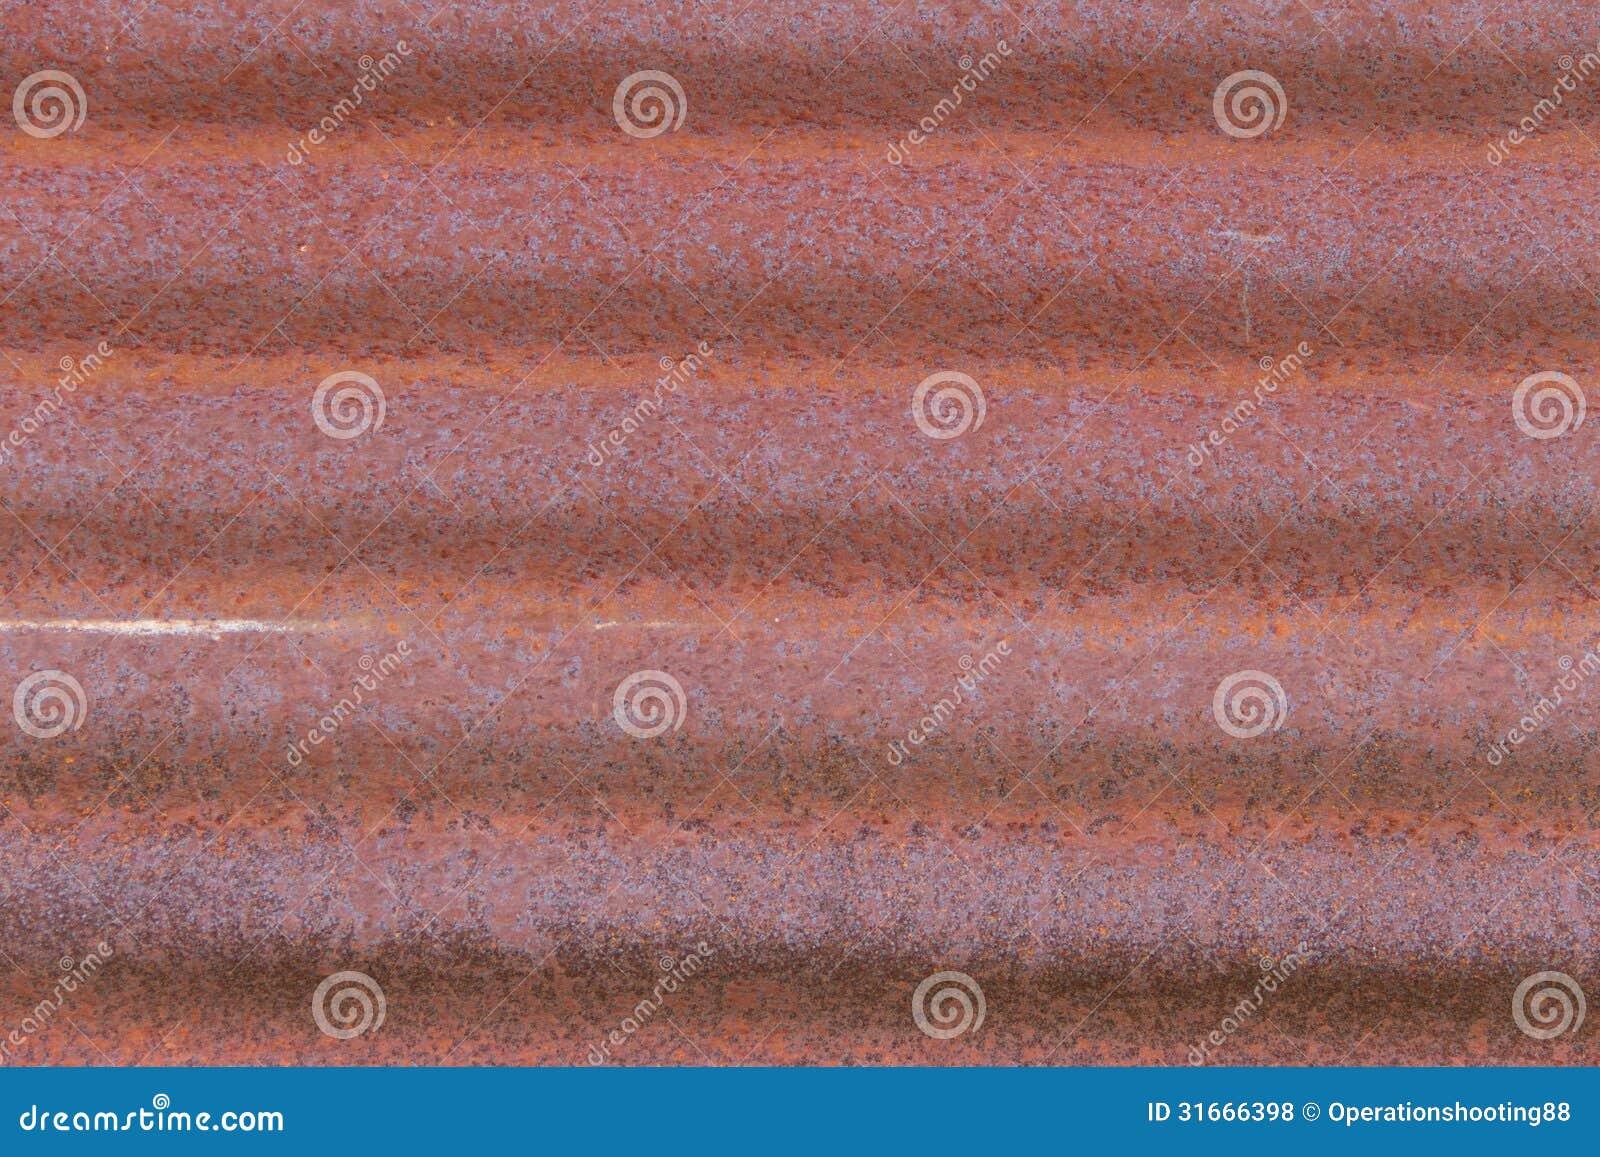 Galvanized Sheet Rust Royalty Free Stock Photos Image